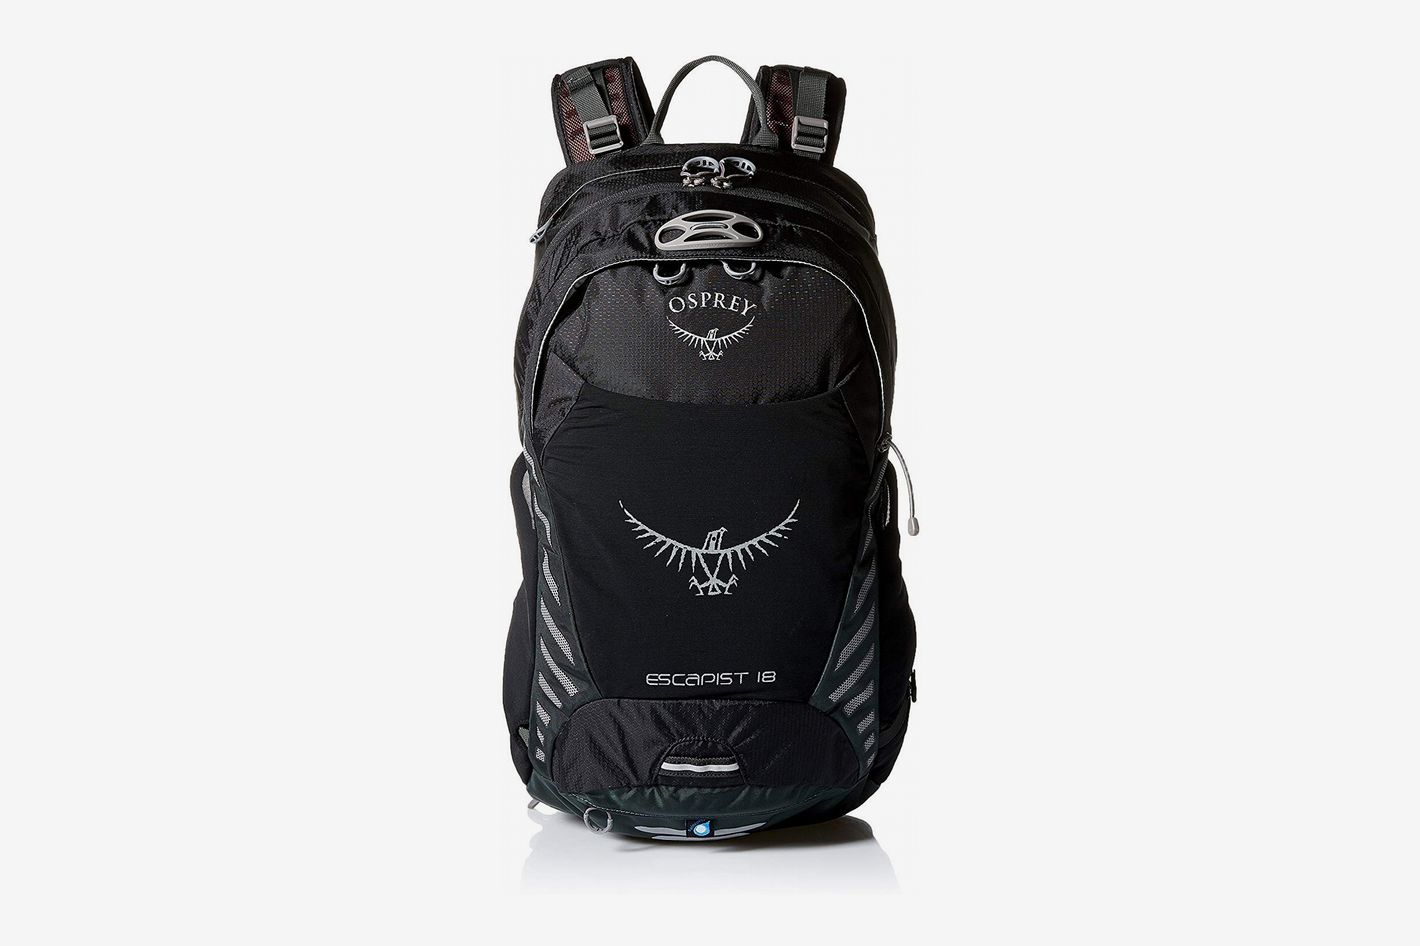 Osprey Escapist 18 Daypacks